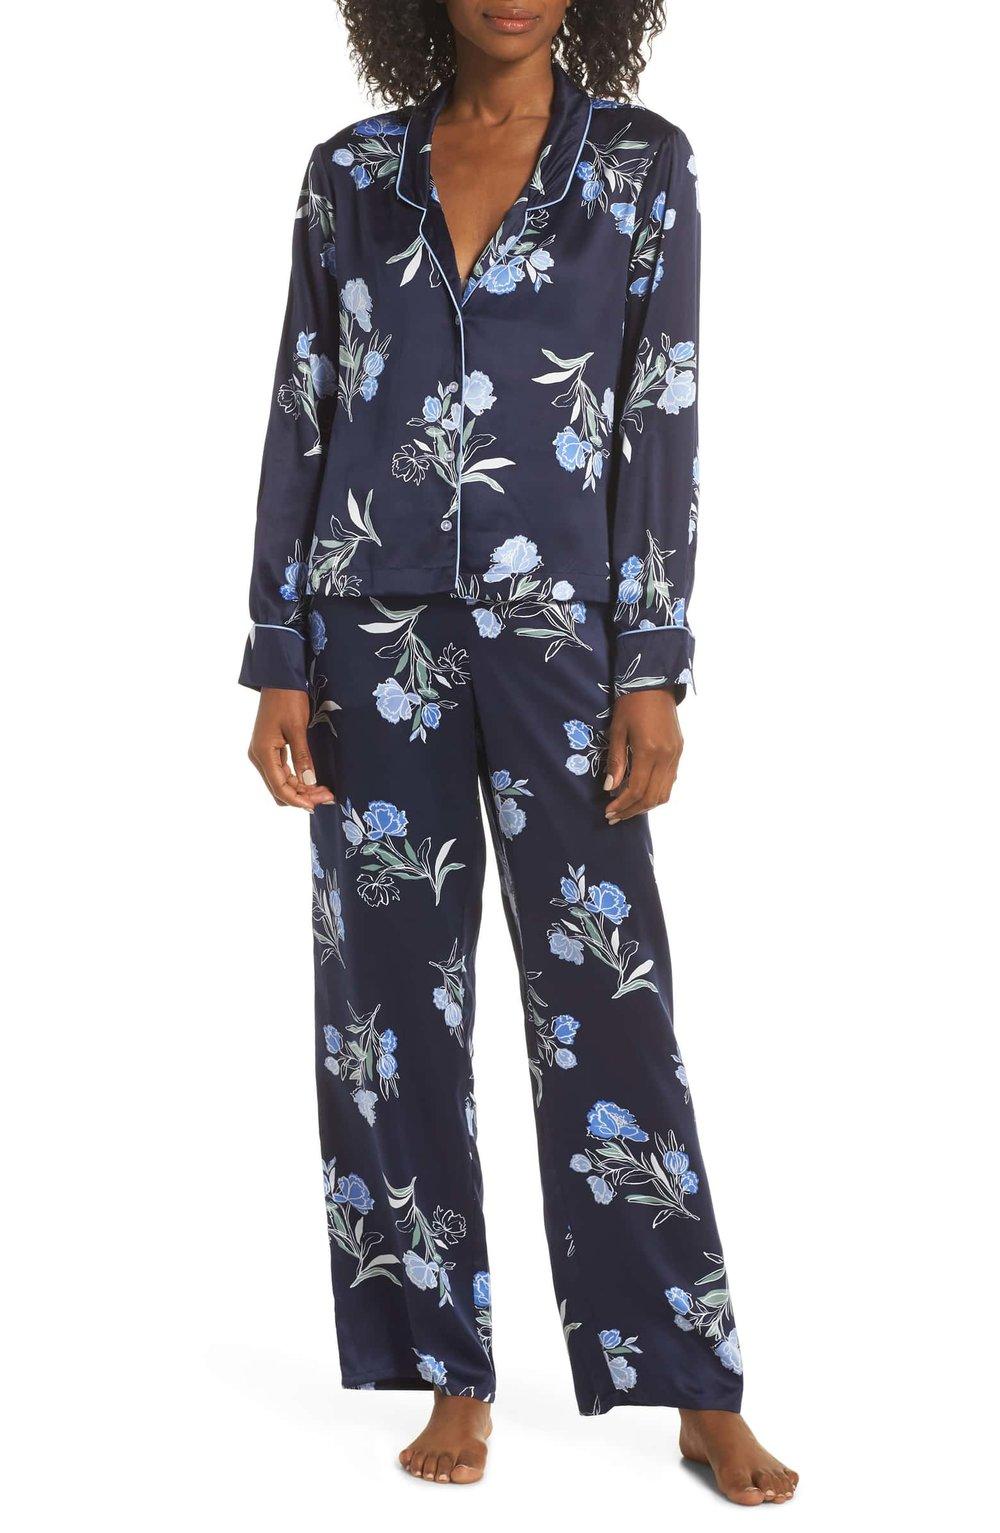 Satin Pajamas - Splendid, shop here.